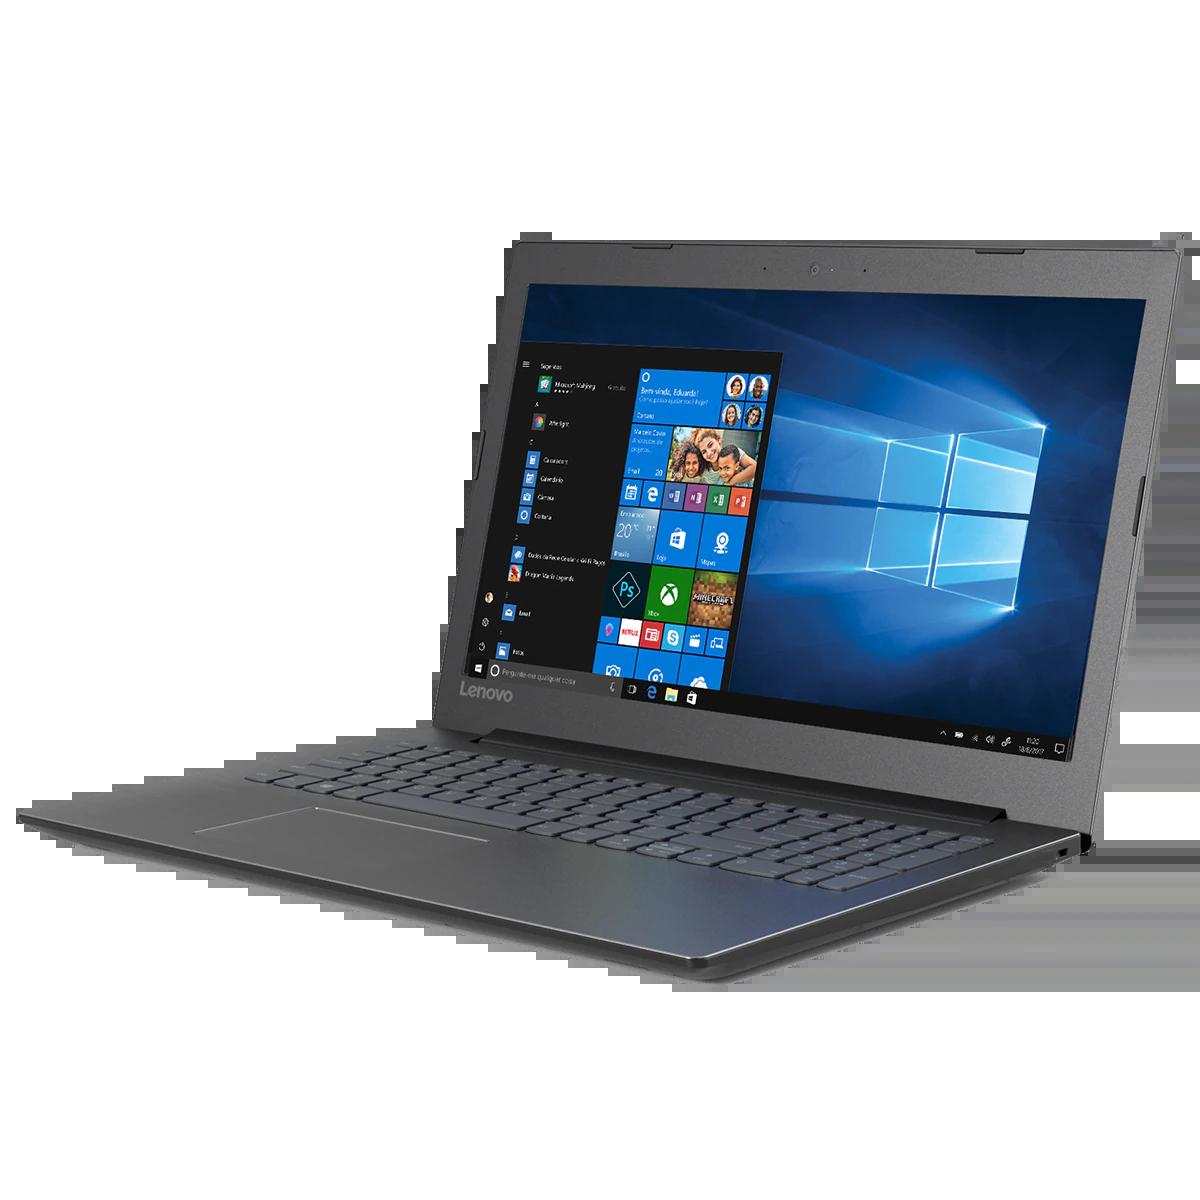 Notebook Lenovo B330 Intel Core i3 7020U, 4GB, 500GB, Windows 10 Home, 81G70004BR